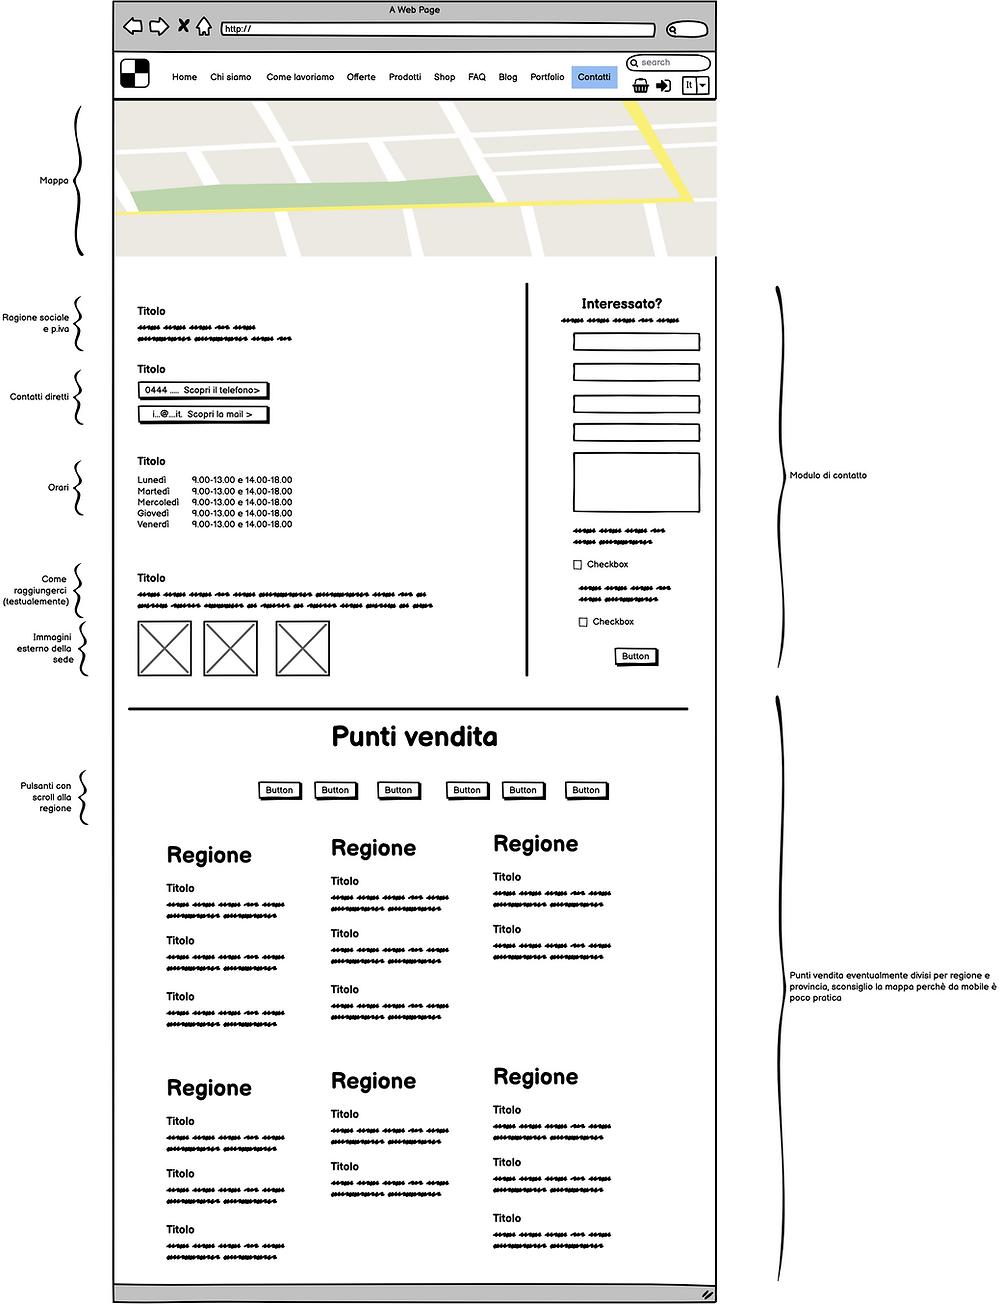 Schema Pagina contatti - Web design - Wix, Wordpress, Magento, Prestashop